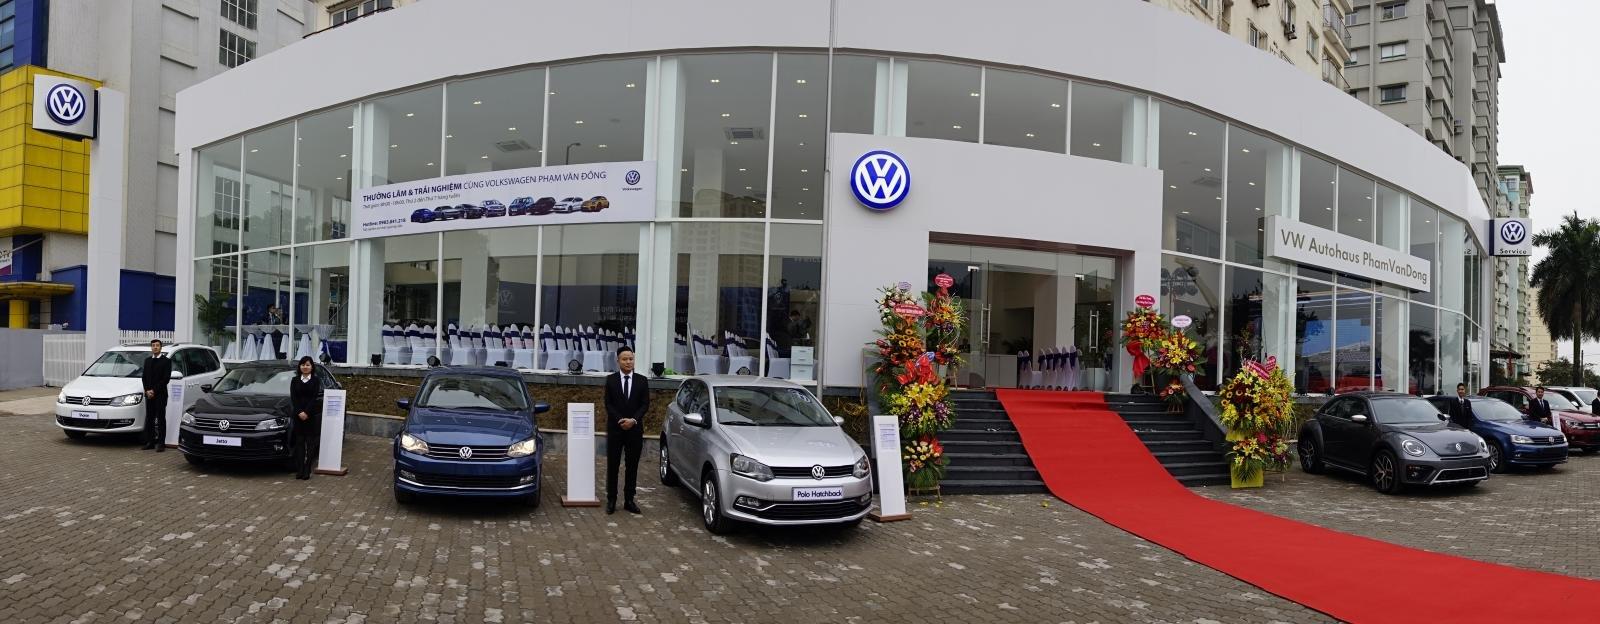 Volkswagen Phạm Văn Đồng (1)